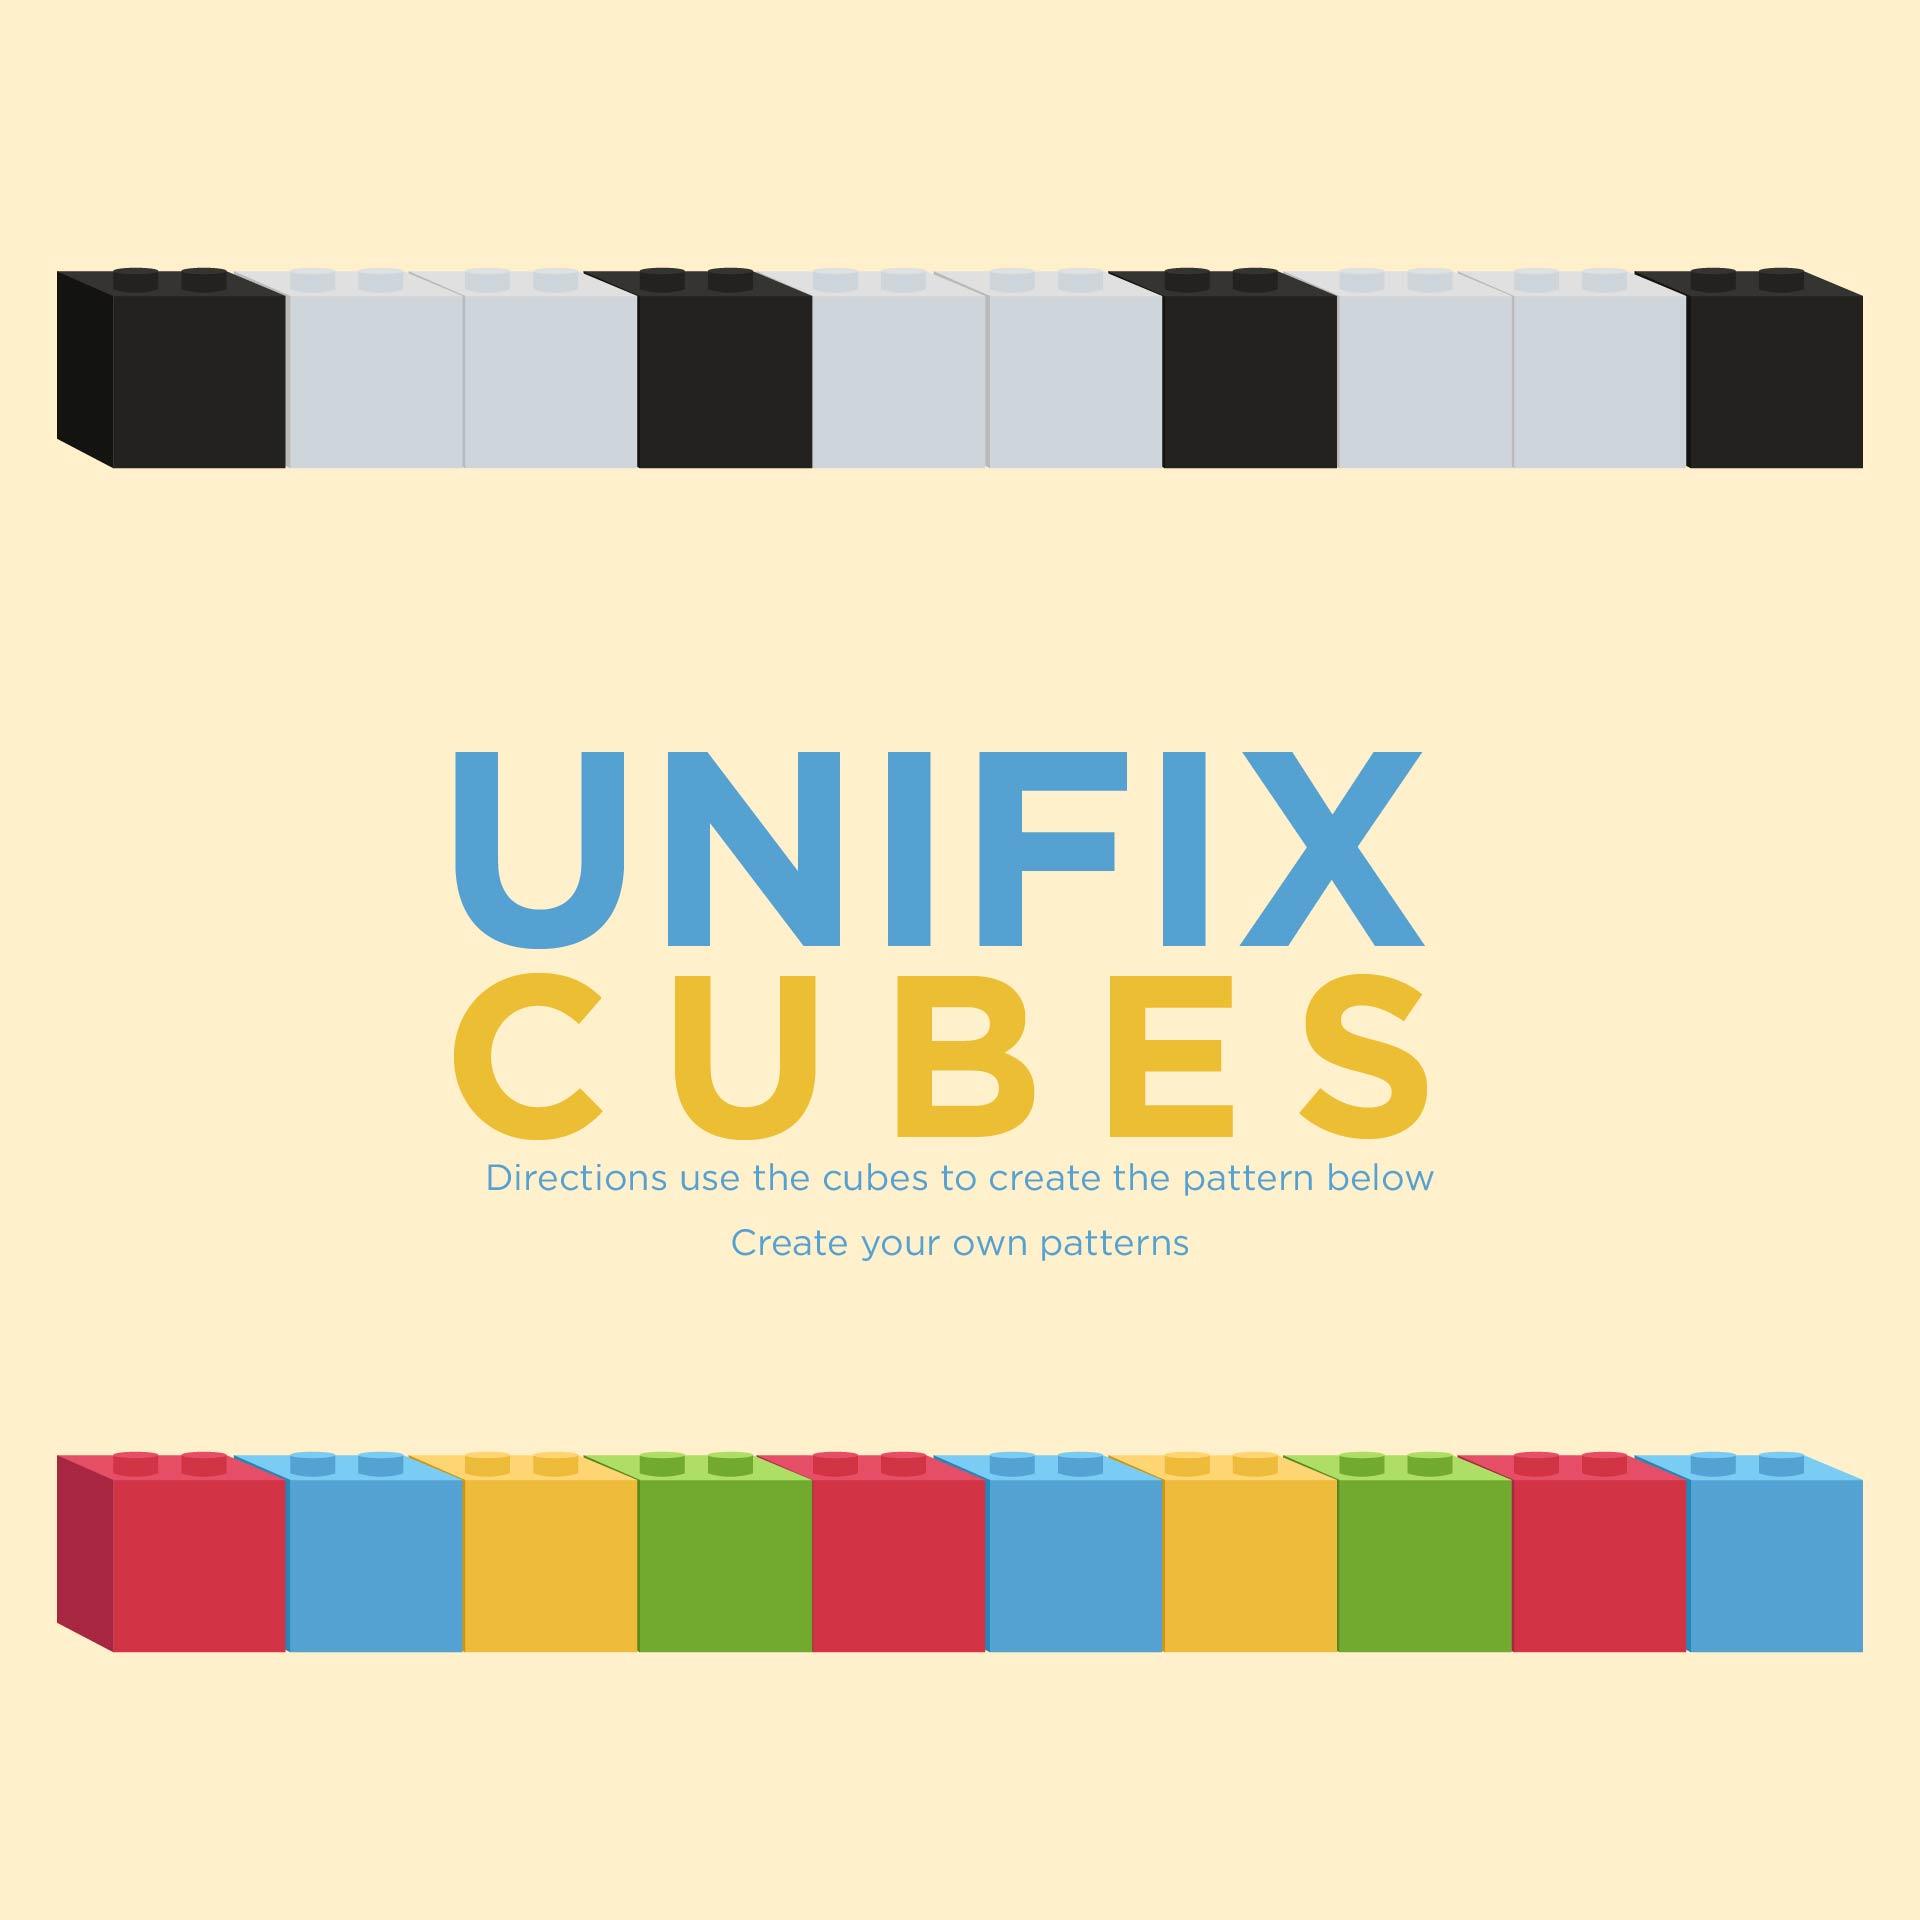 5 Best Images of Unifix Cube Template Printable - Unifix Cube ...